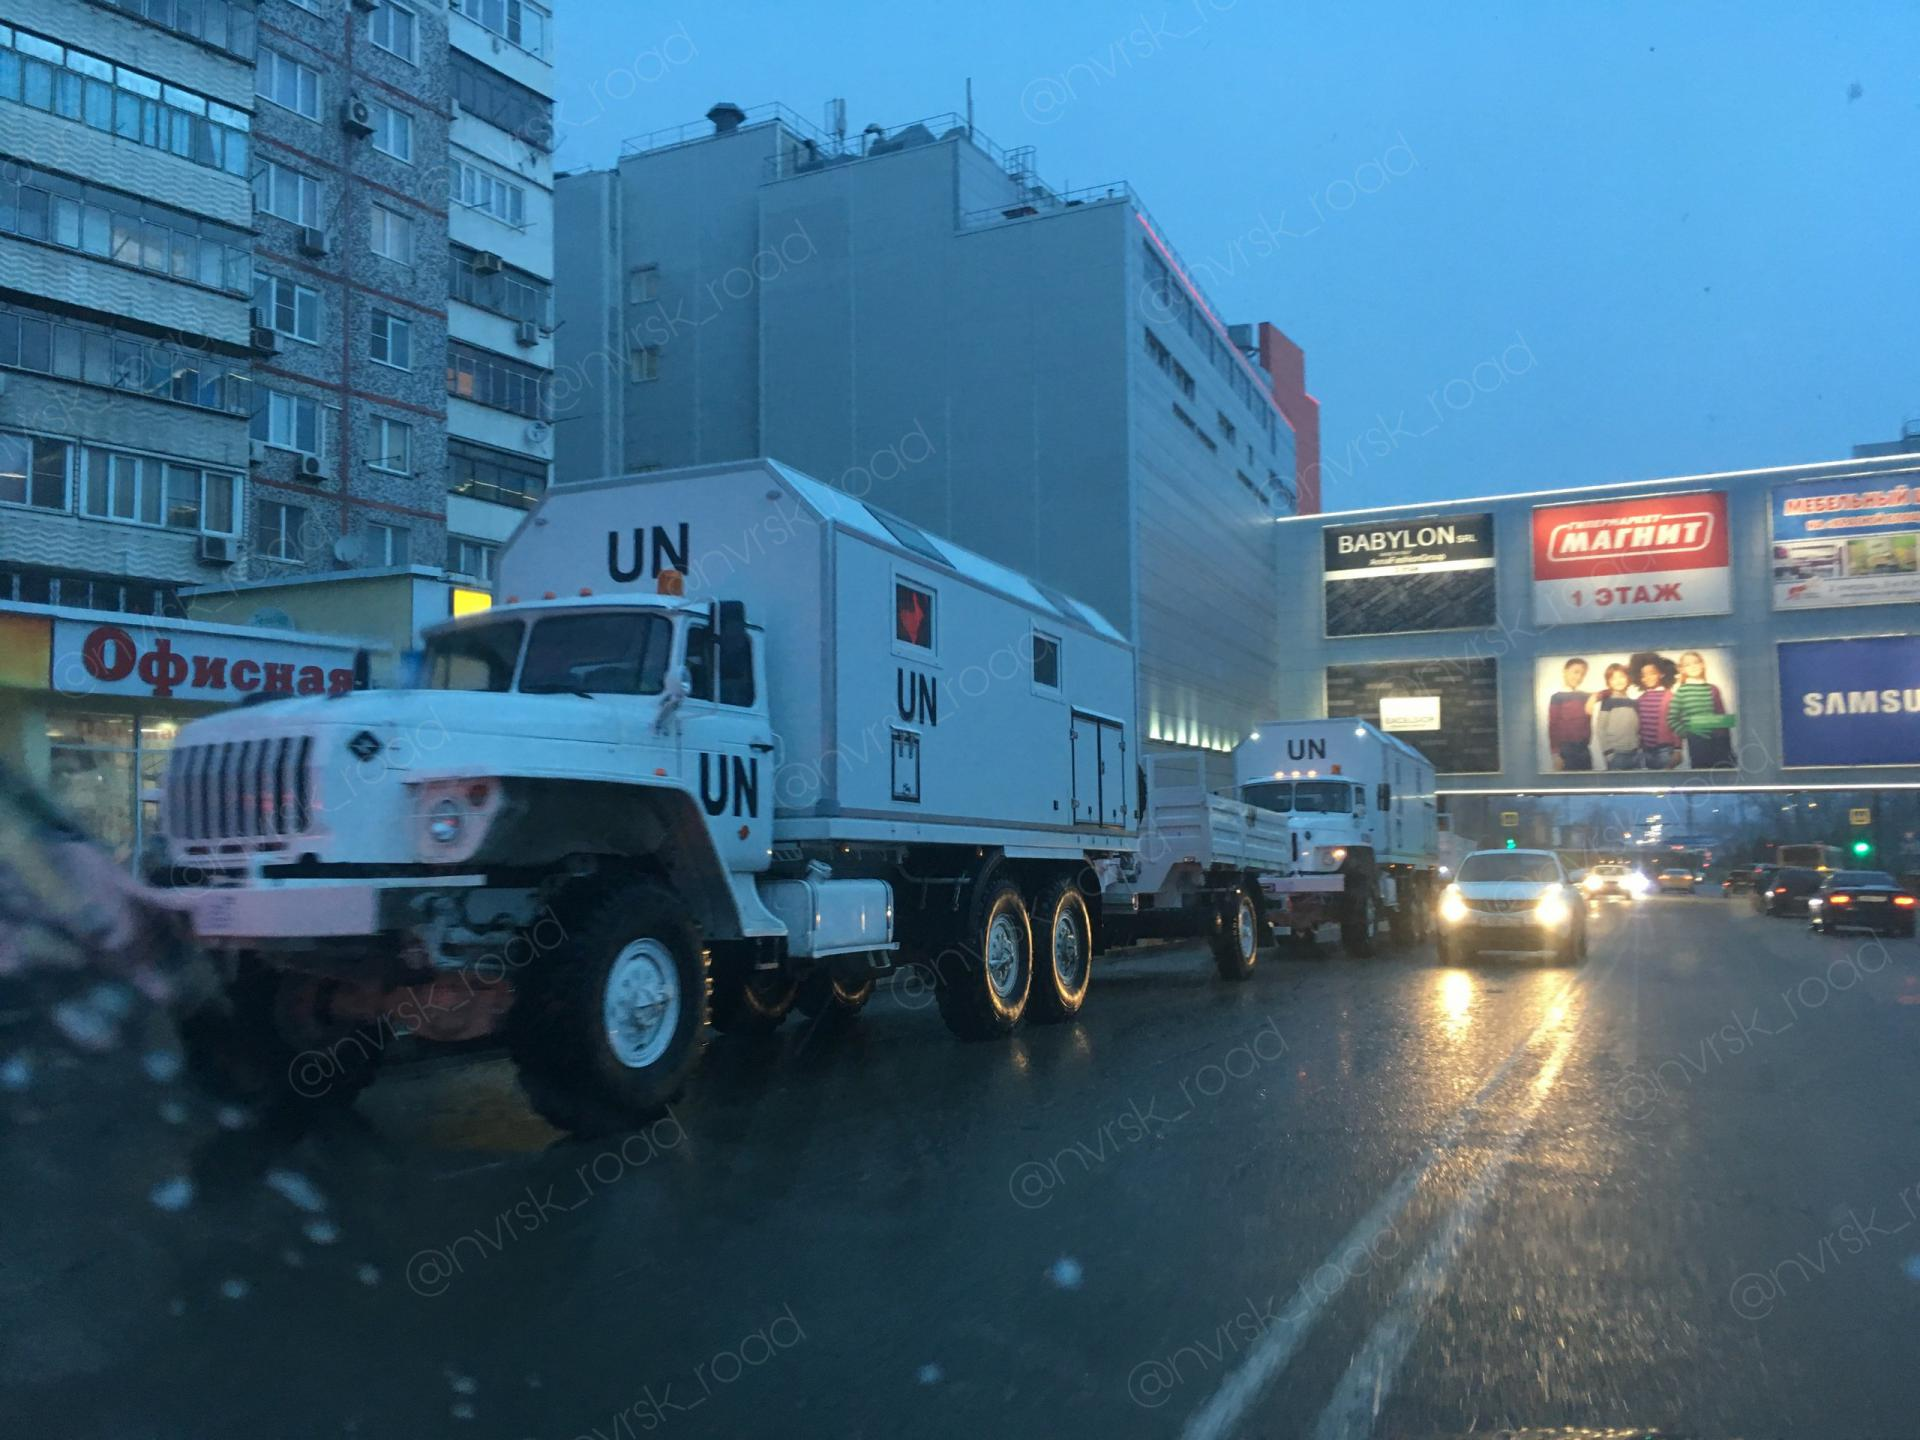 http://gorod-novoross.ru/news_foto/full/f7l2u0-h5_9sgx3b8e4opr6wck1ynm.jpg